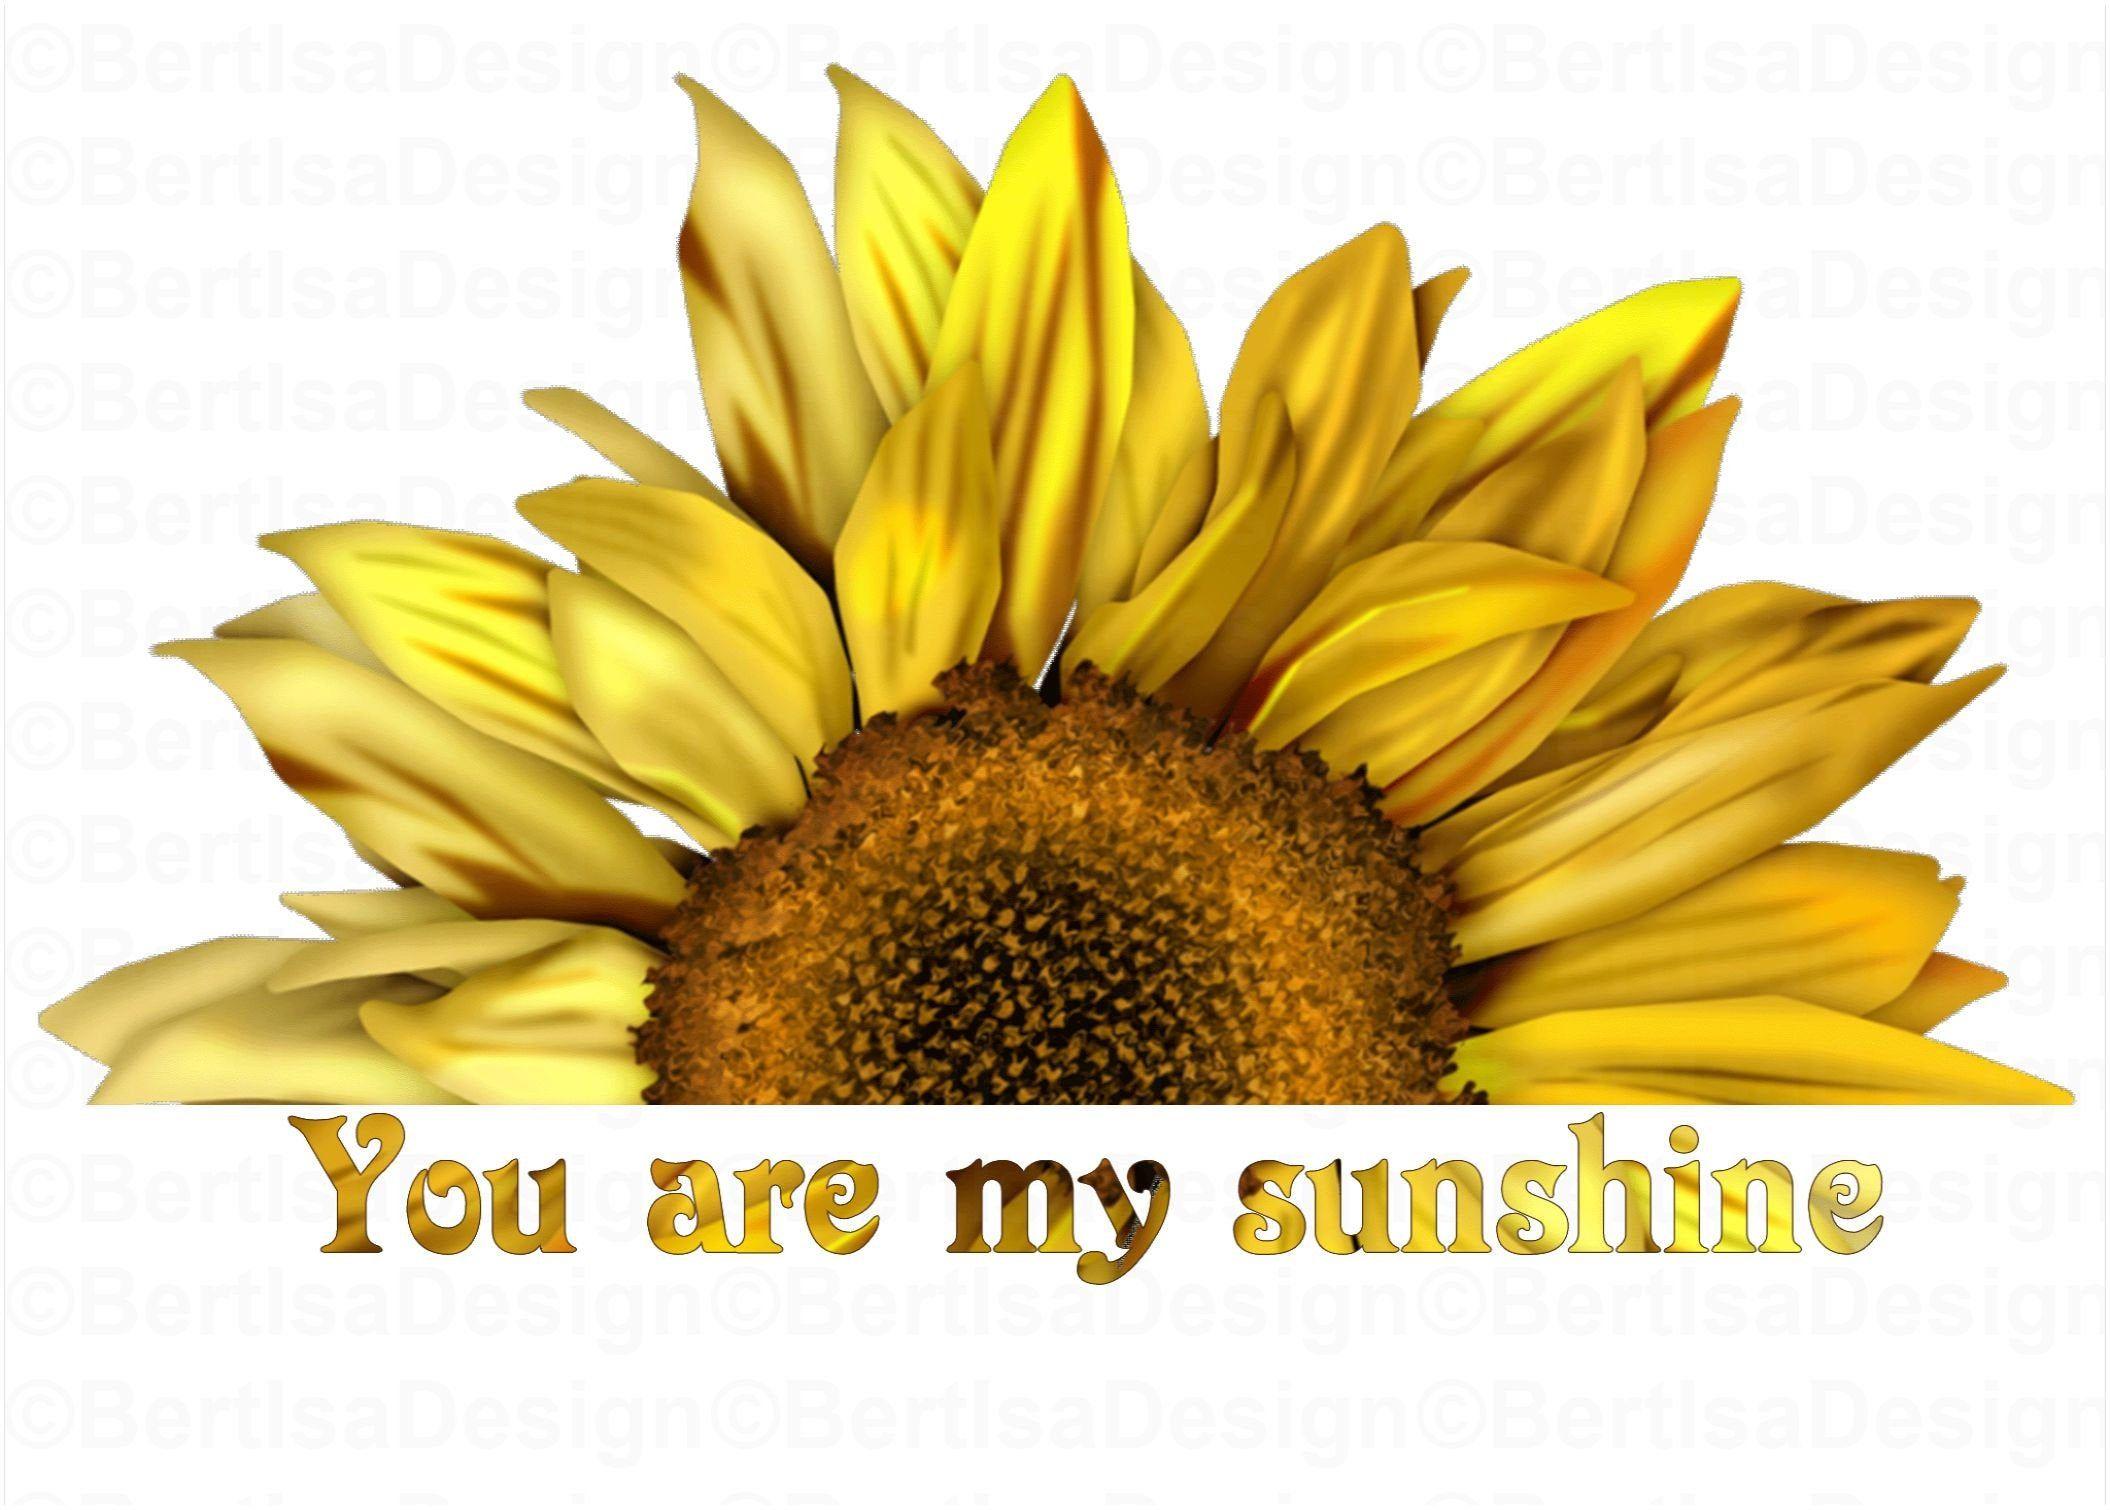 You are my sunshine,Half Sunflower Sublimation Design ... (2110 x 1510 Pixel)